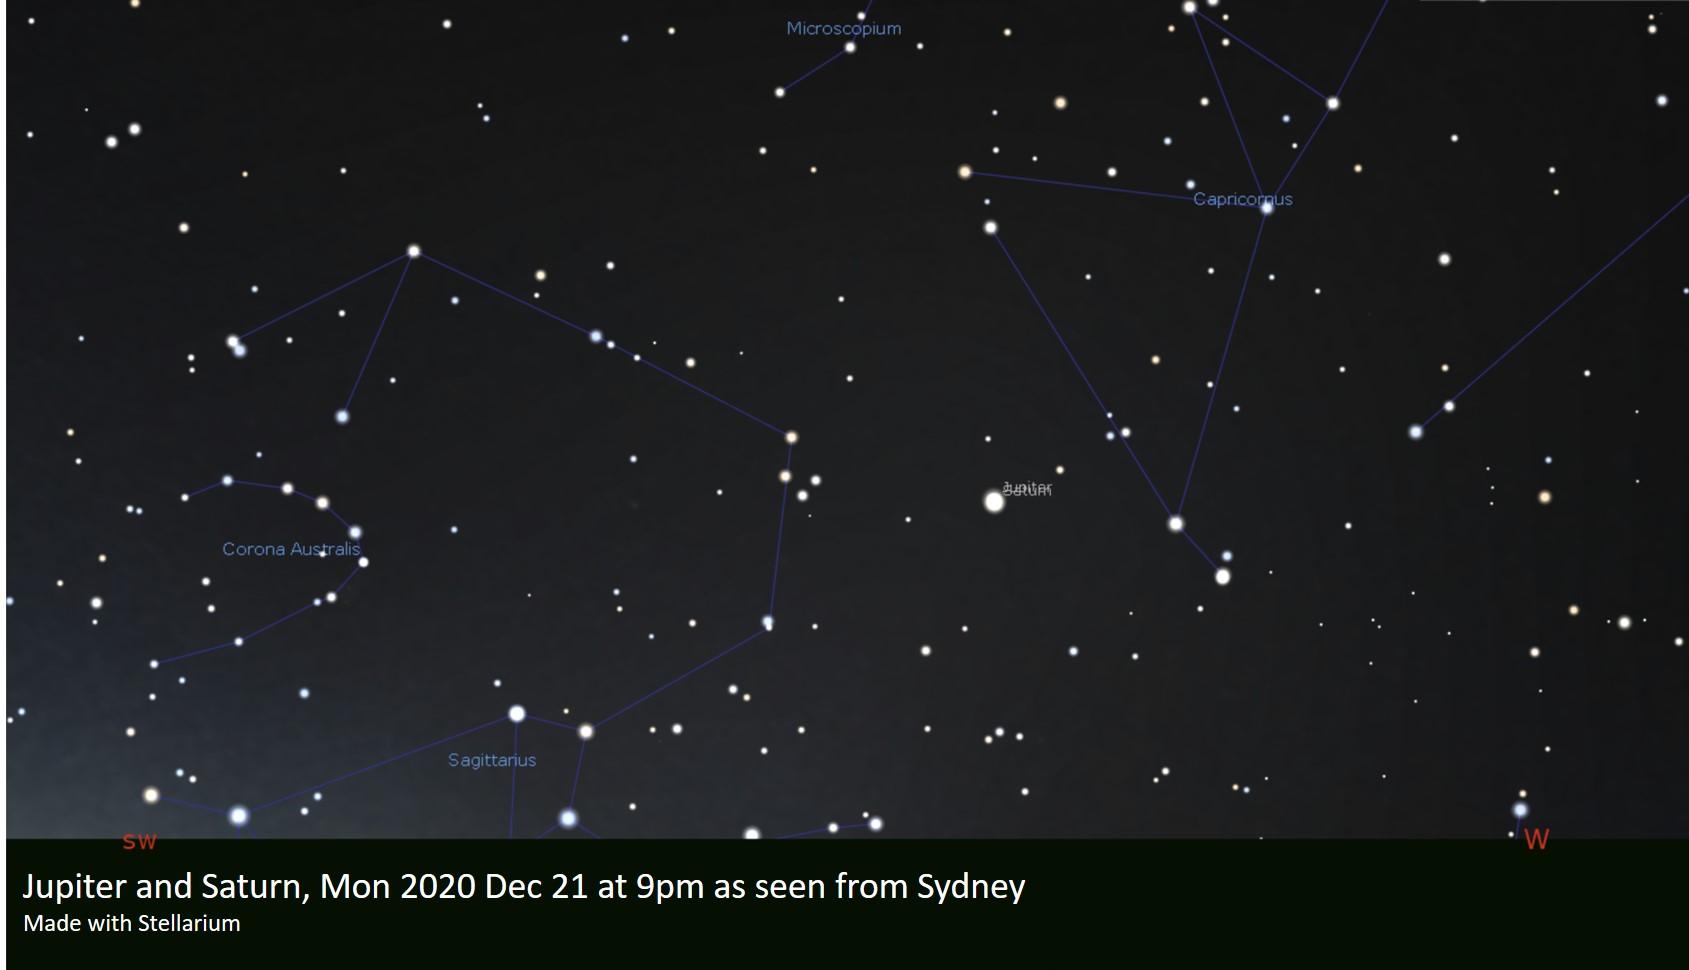 The 2020 December Jupiter-Saturn conjunction & appulse